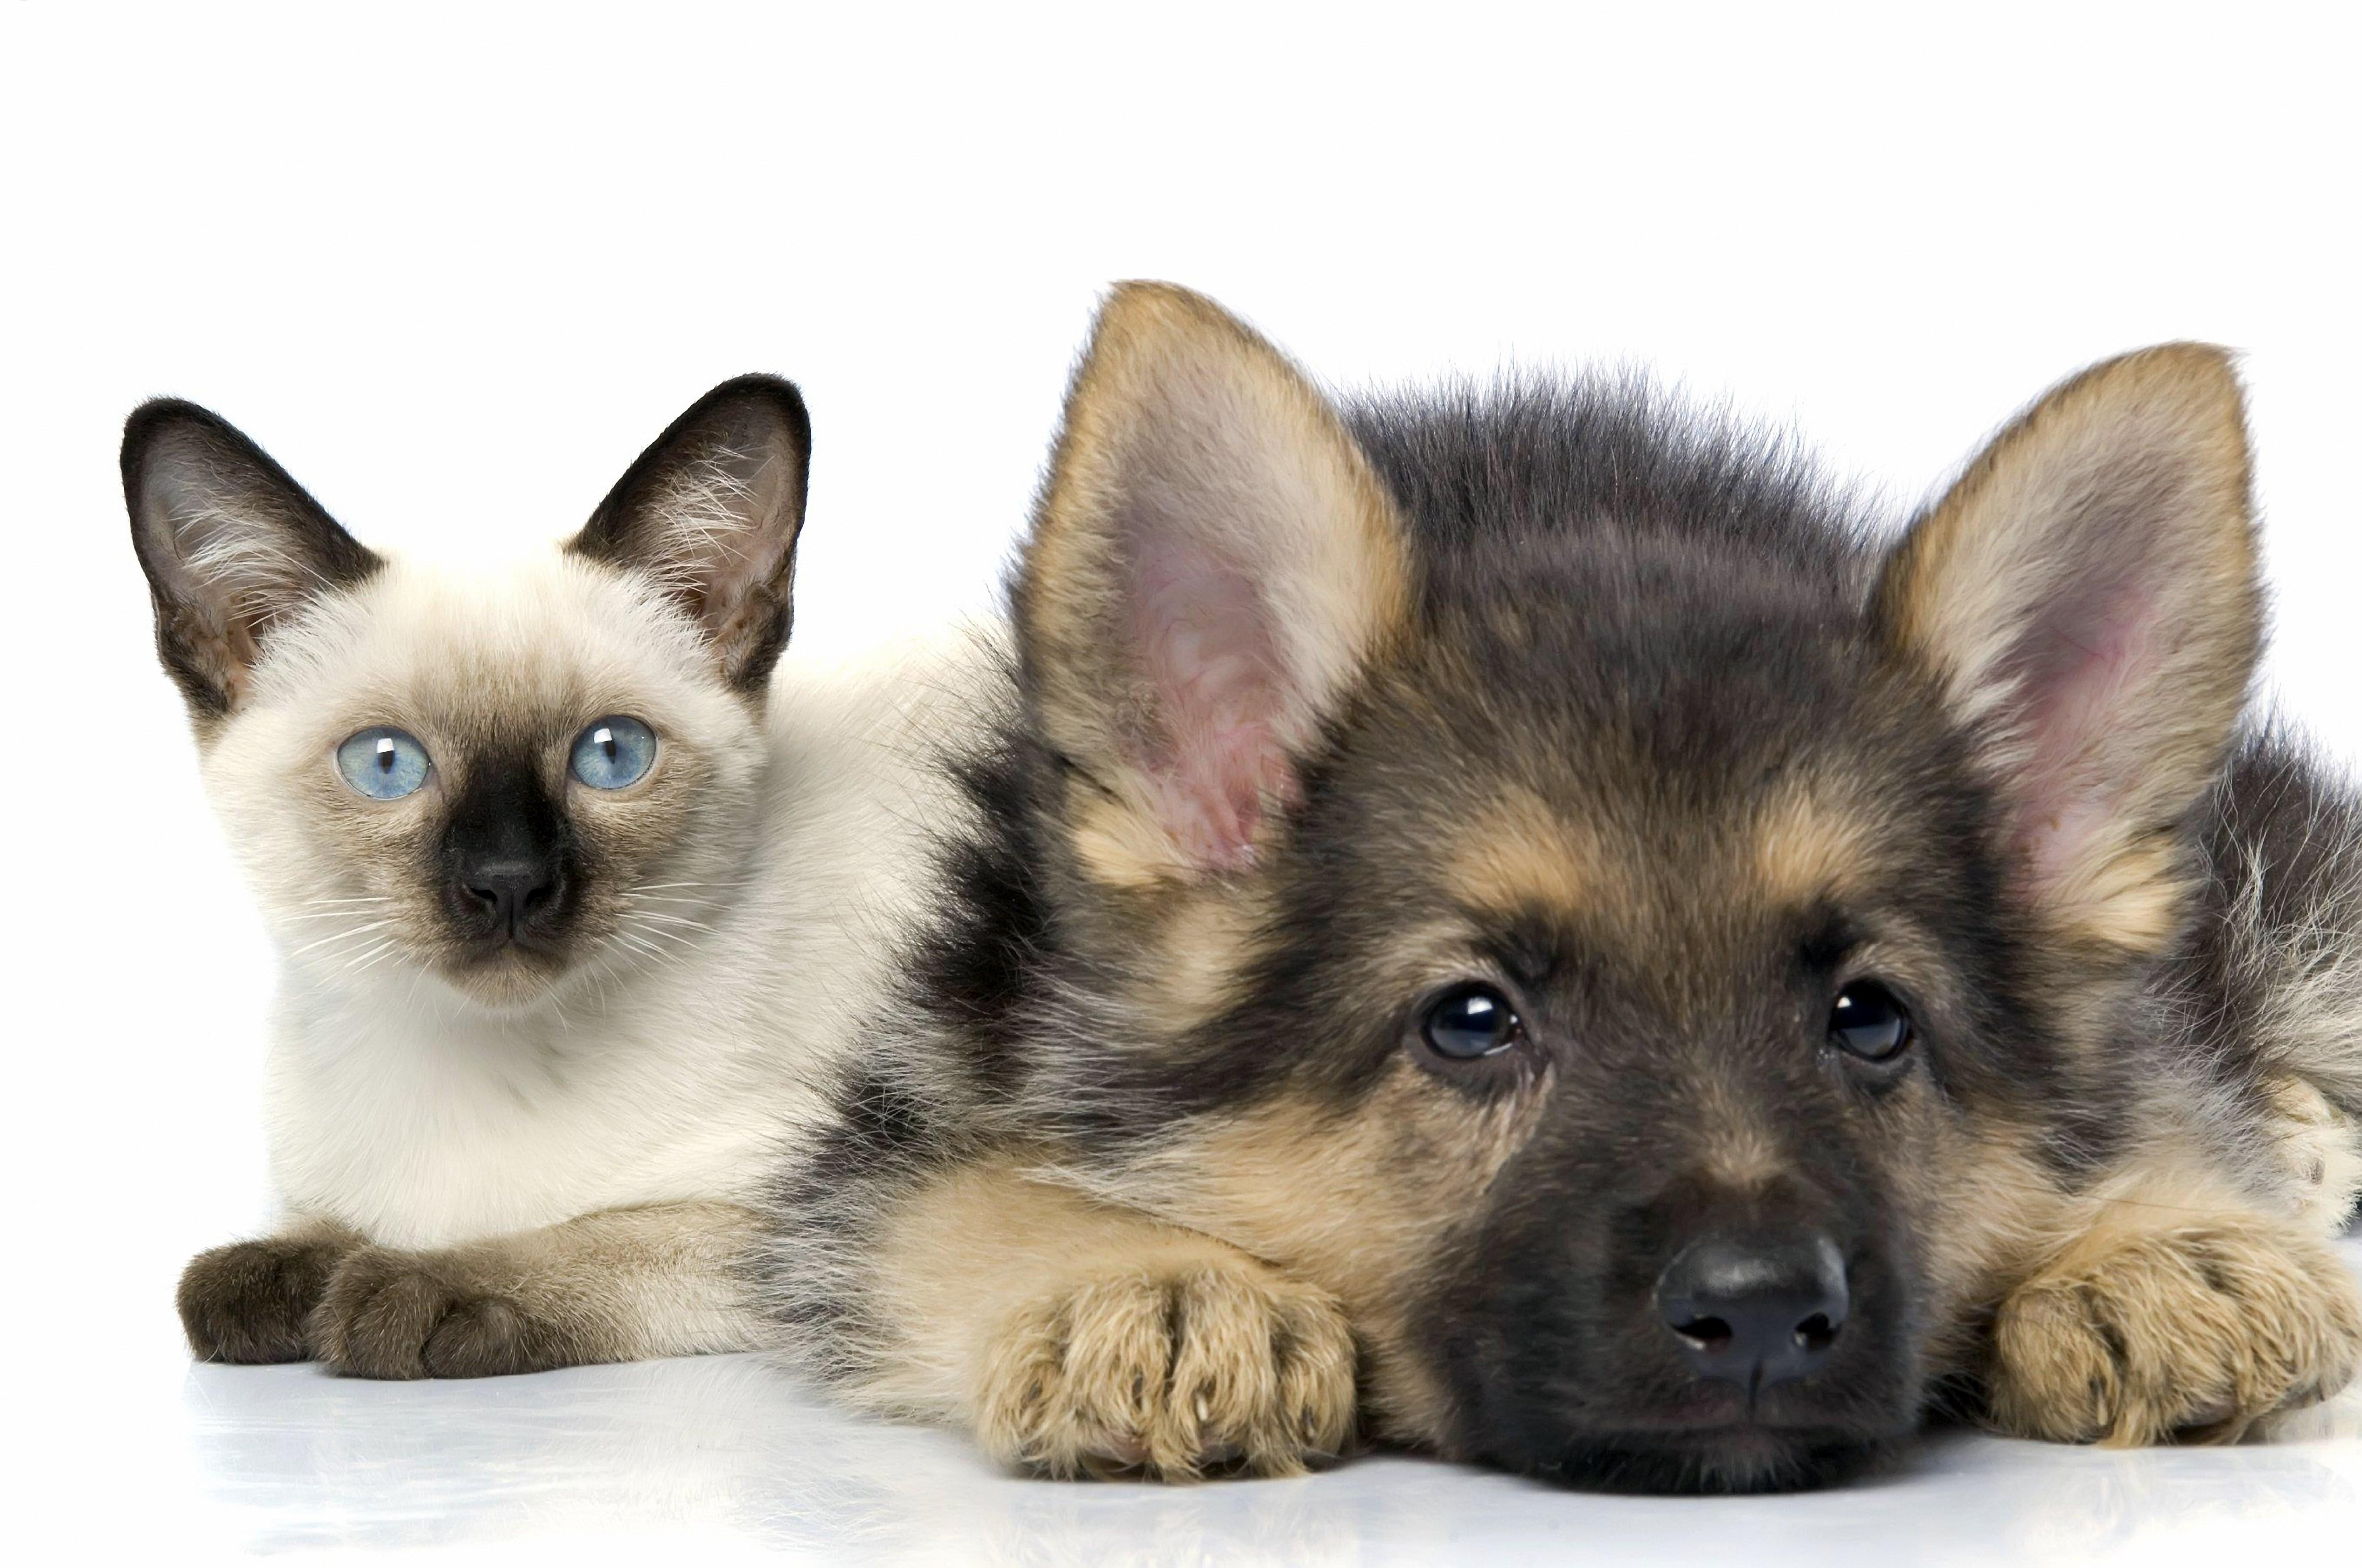 cat & dog resting